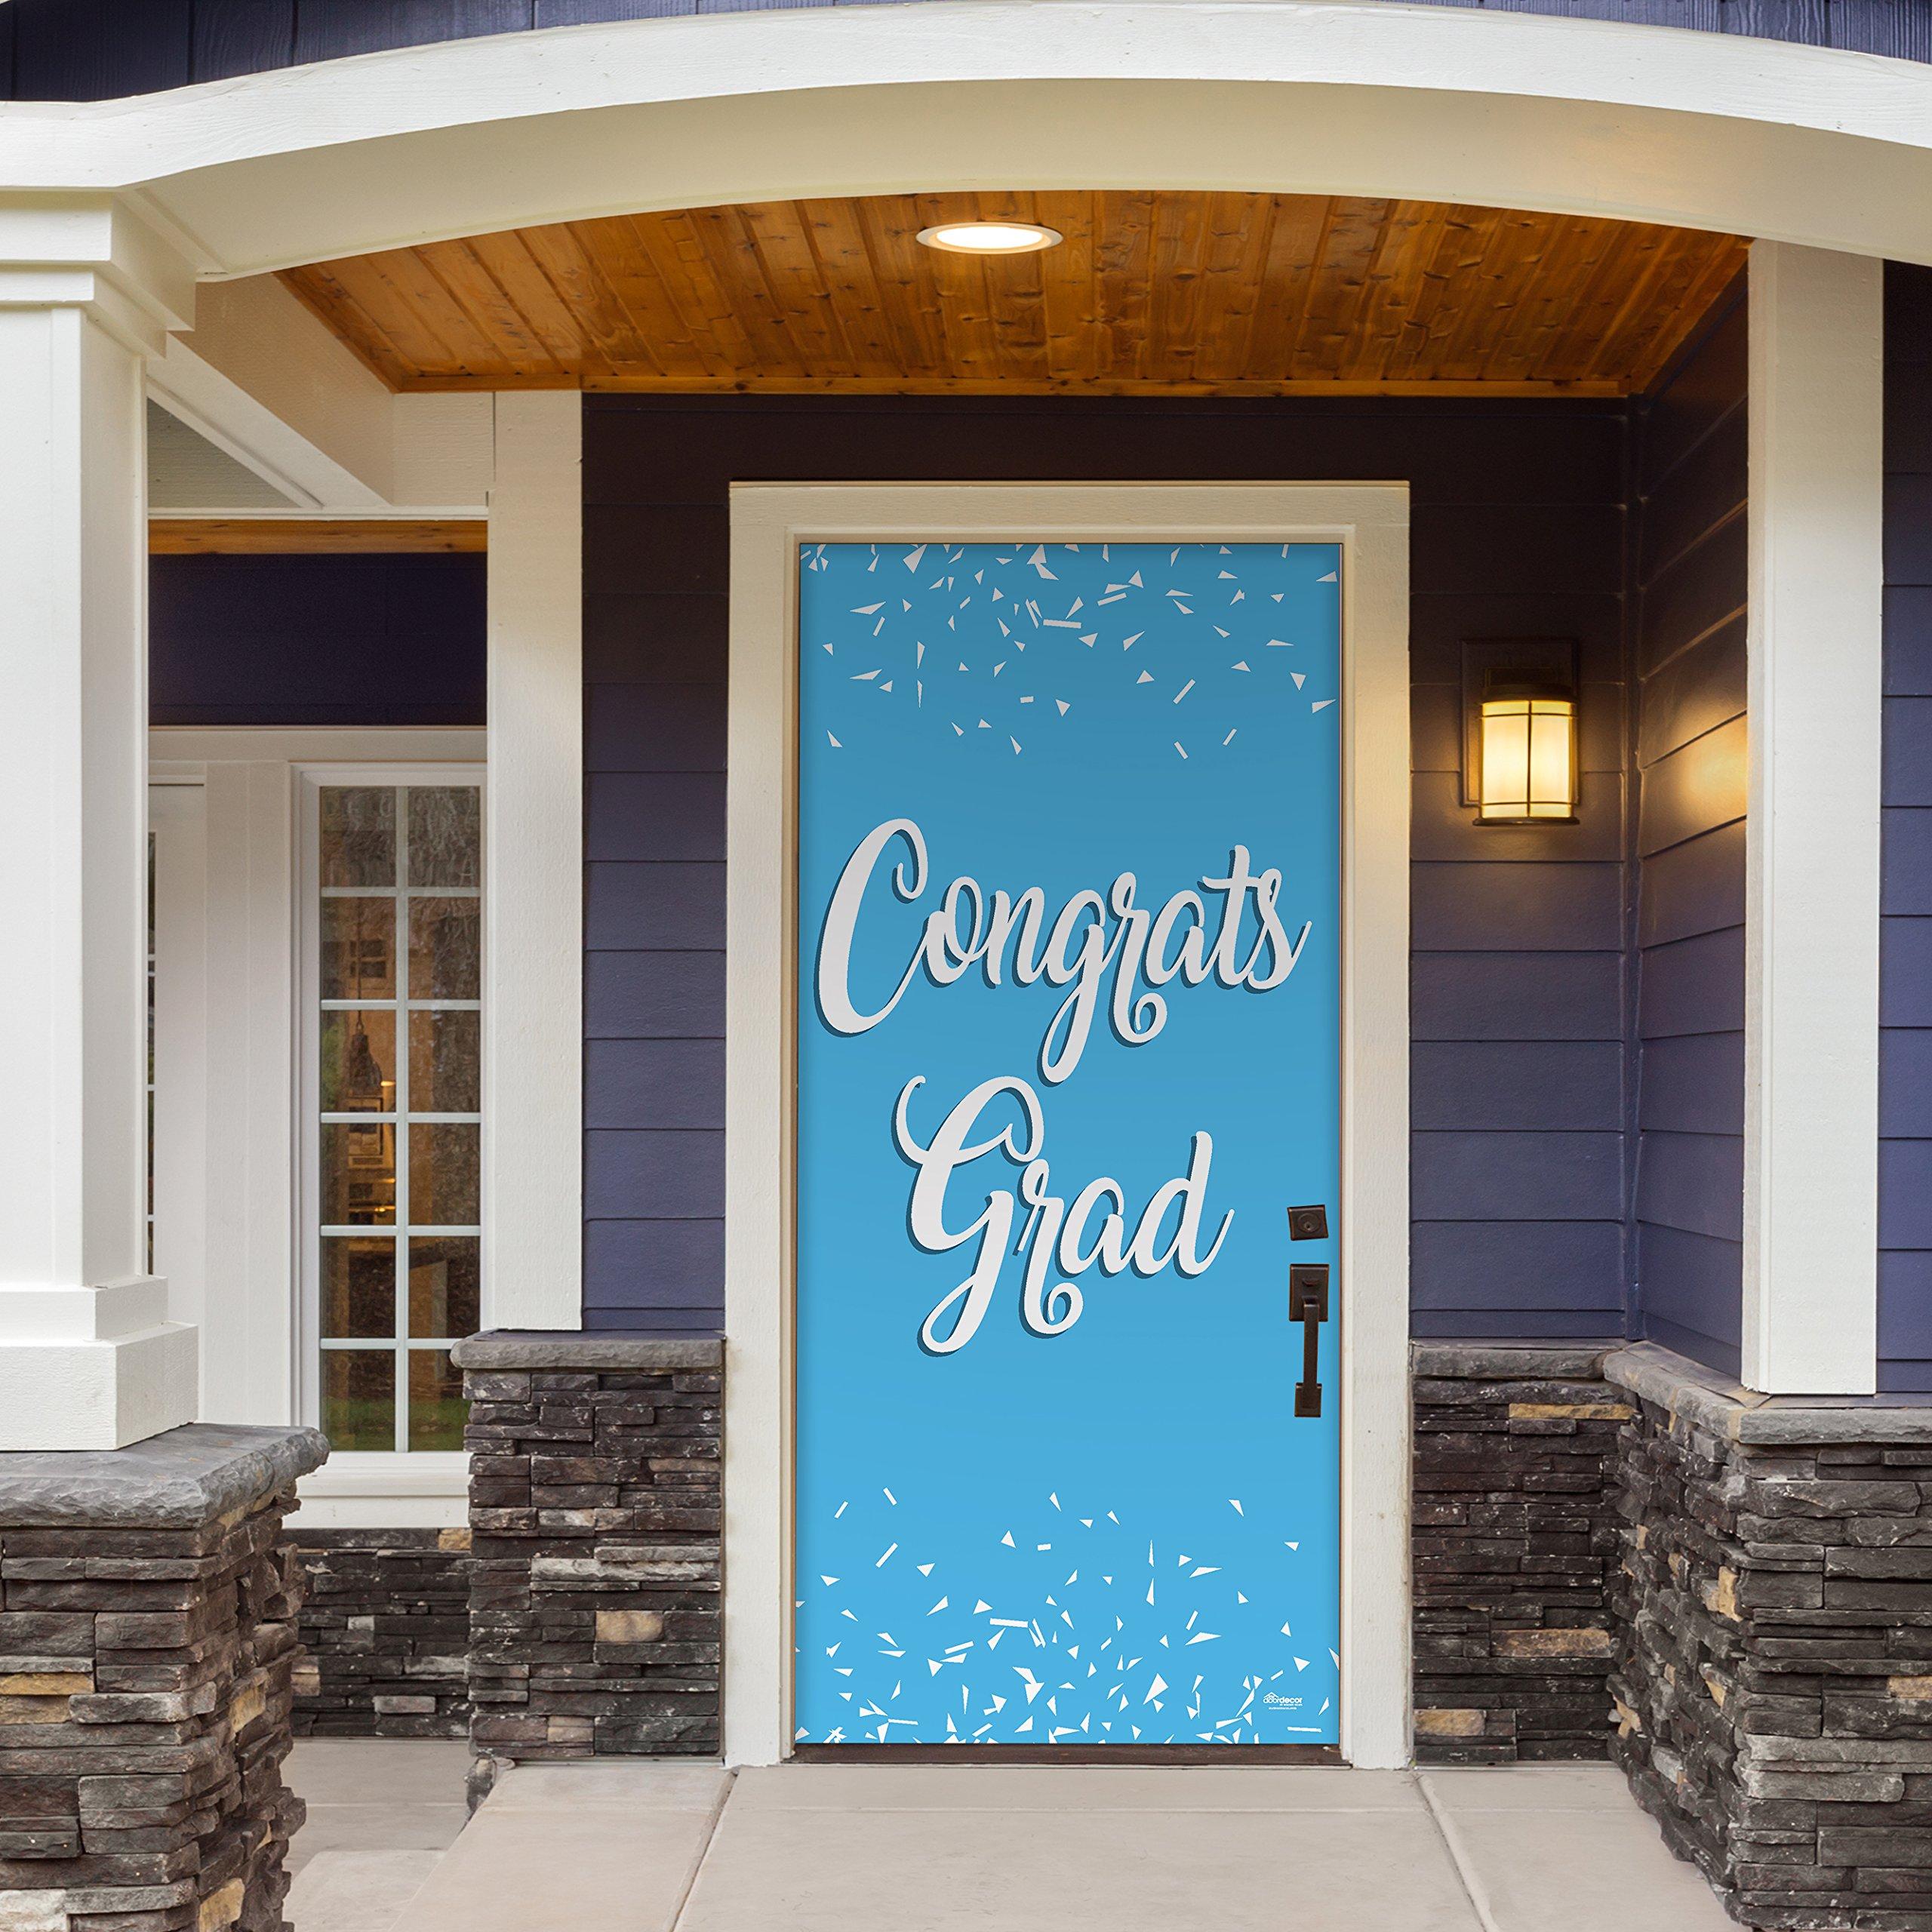 Victory Corps Congrats Grad Light Blue - Outdoor GRADUATION Garage Door Banner Mural Sign Décor 36'' x 80'' One Size Fits All Front Door Car Garage -The Original Holiday Front Door Banner Decor